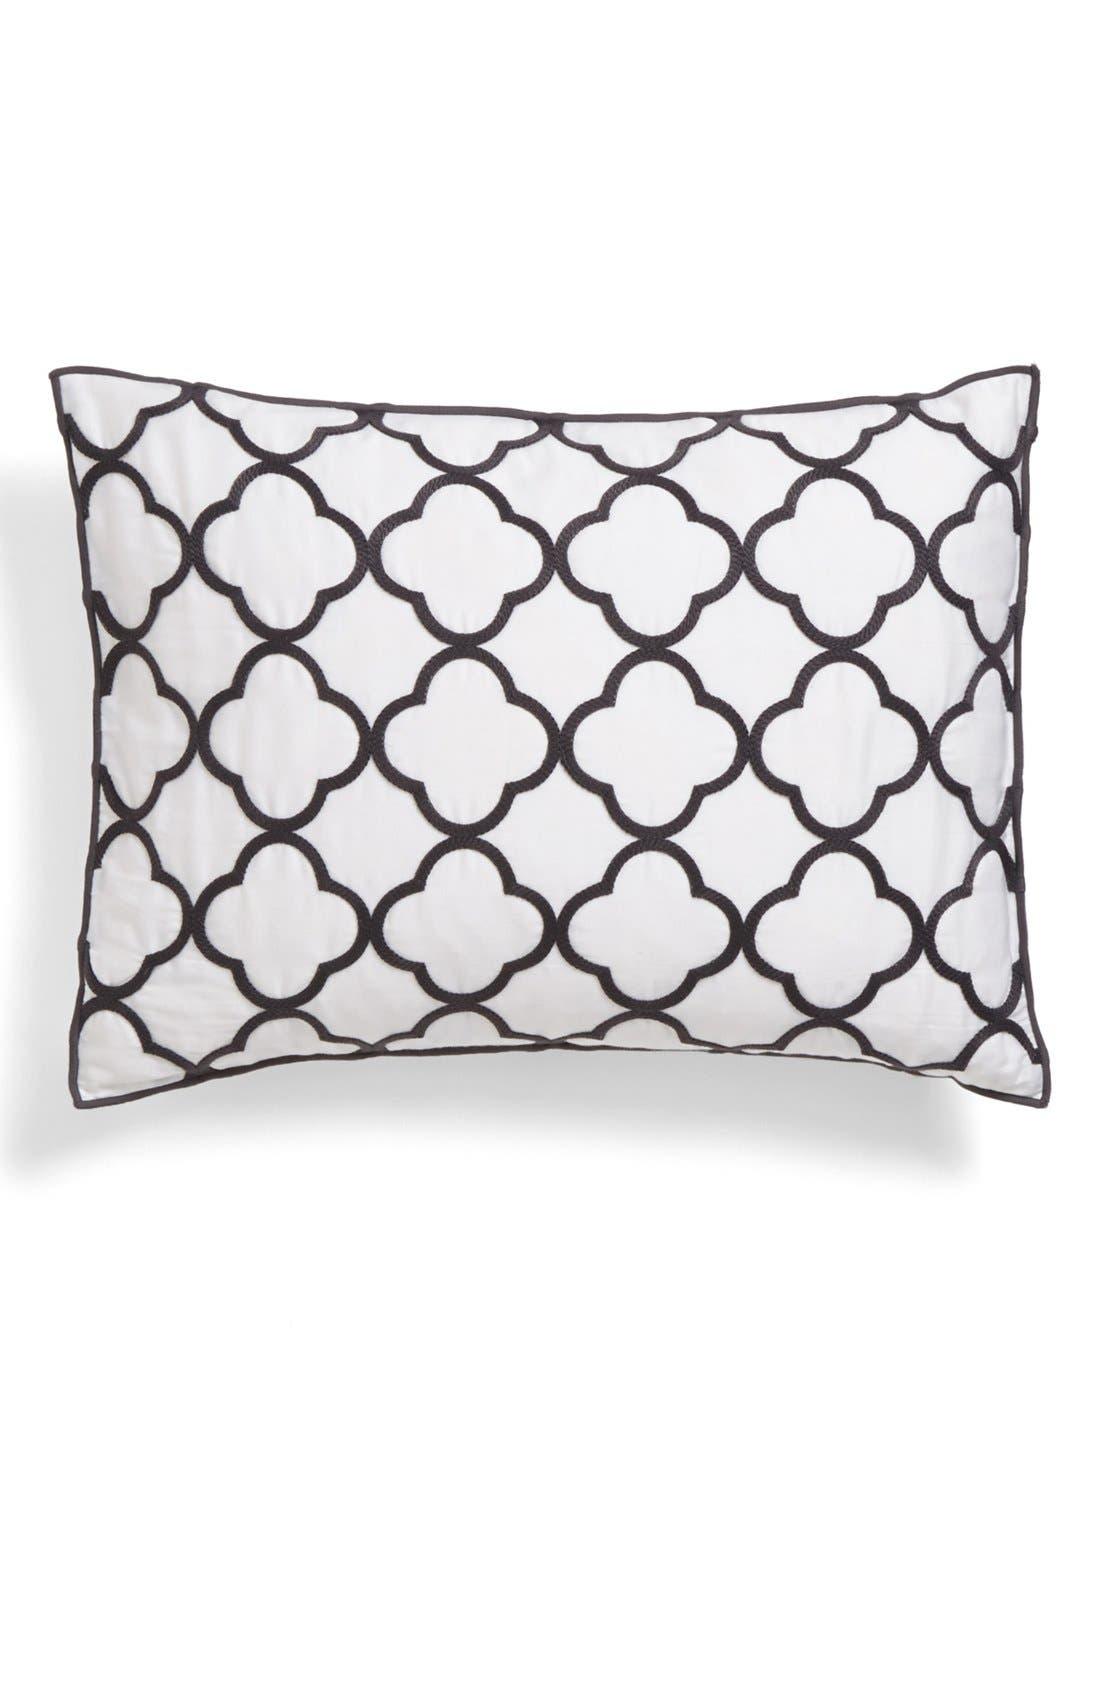 Alternate Image 1 Selected - Vera Wang 'Pompom' Pillow